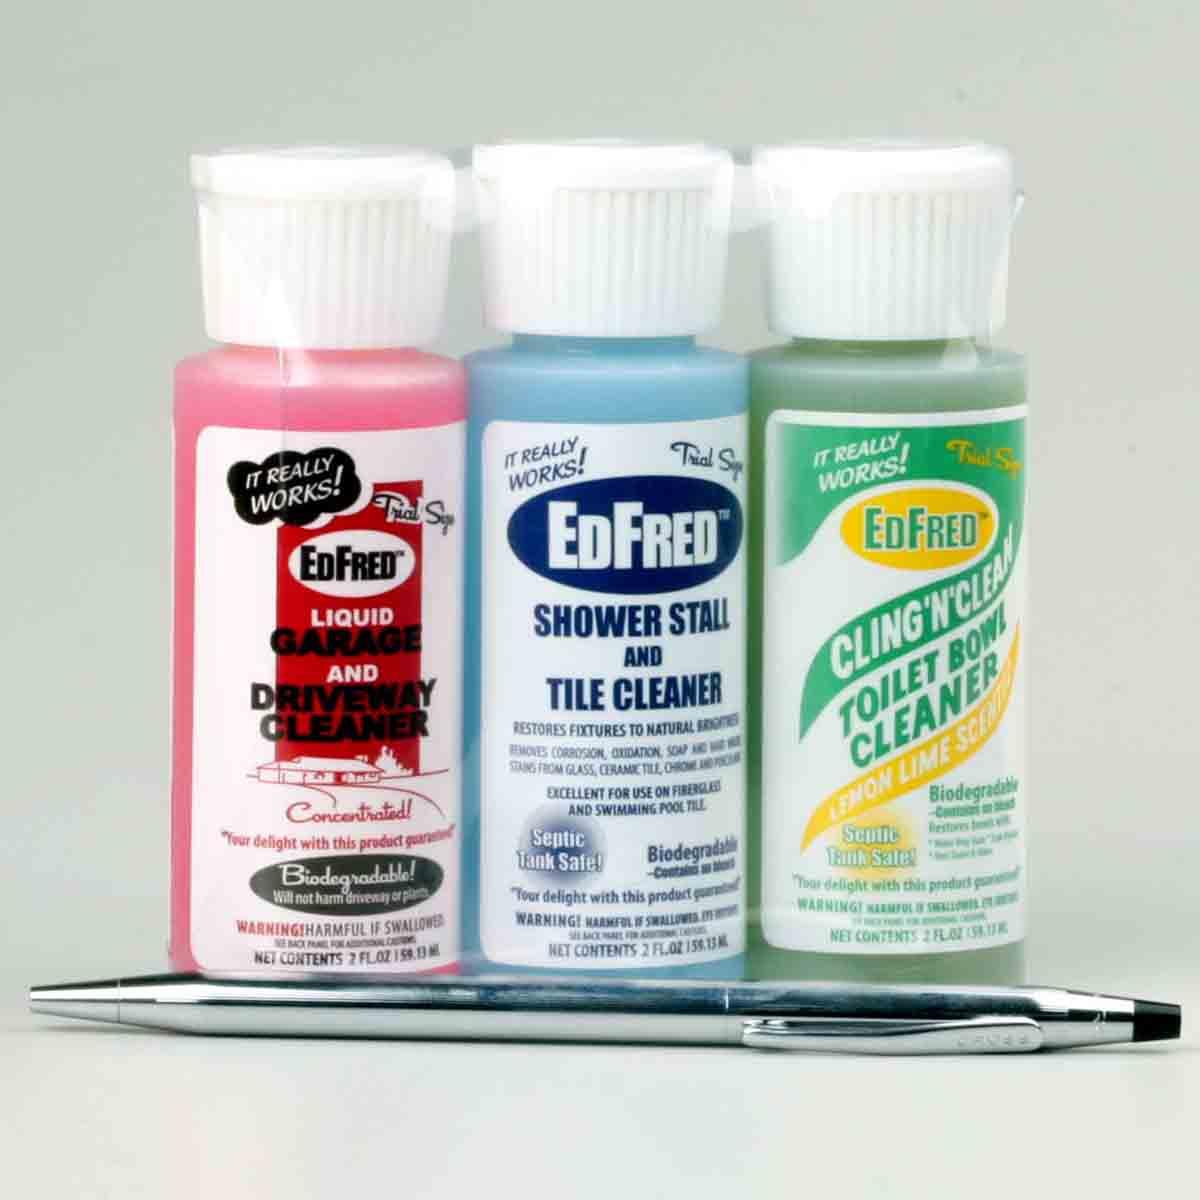 EDFRED 2 Oz. x 3 Triple Shot Stain Pack (FREE SHIPPING Via USPS)